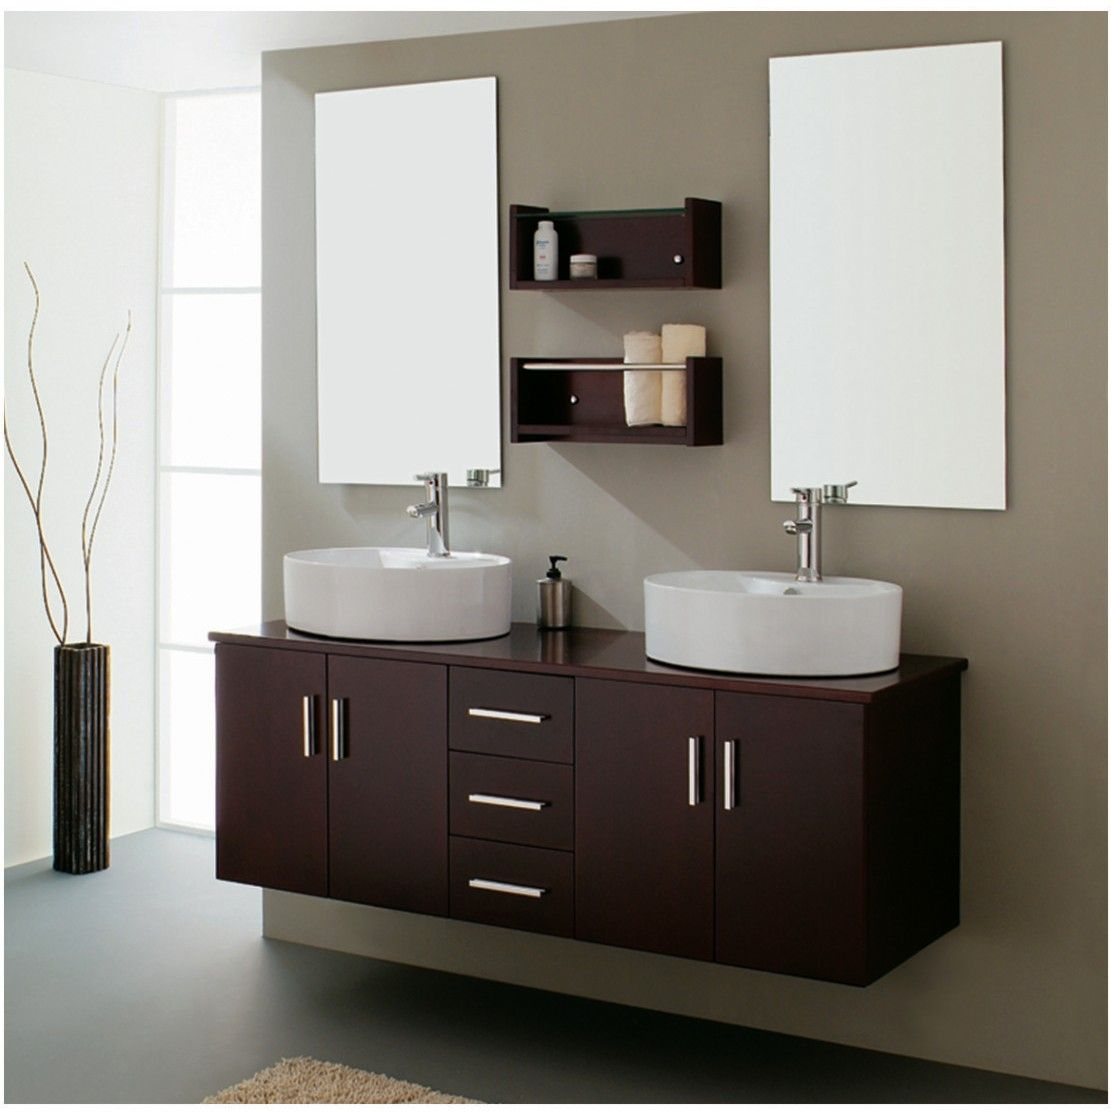 Modern Bathroom Vanity Set Milano Iii Floating Bathroom